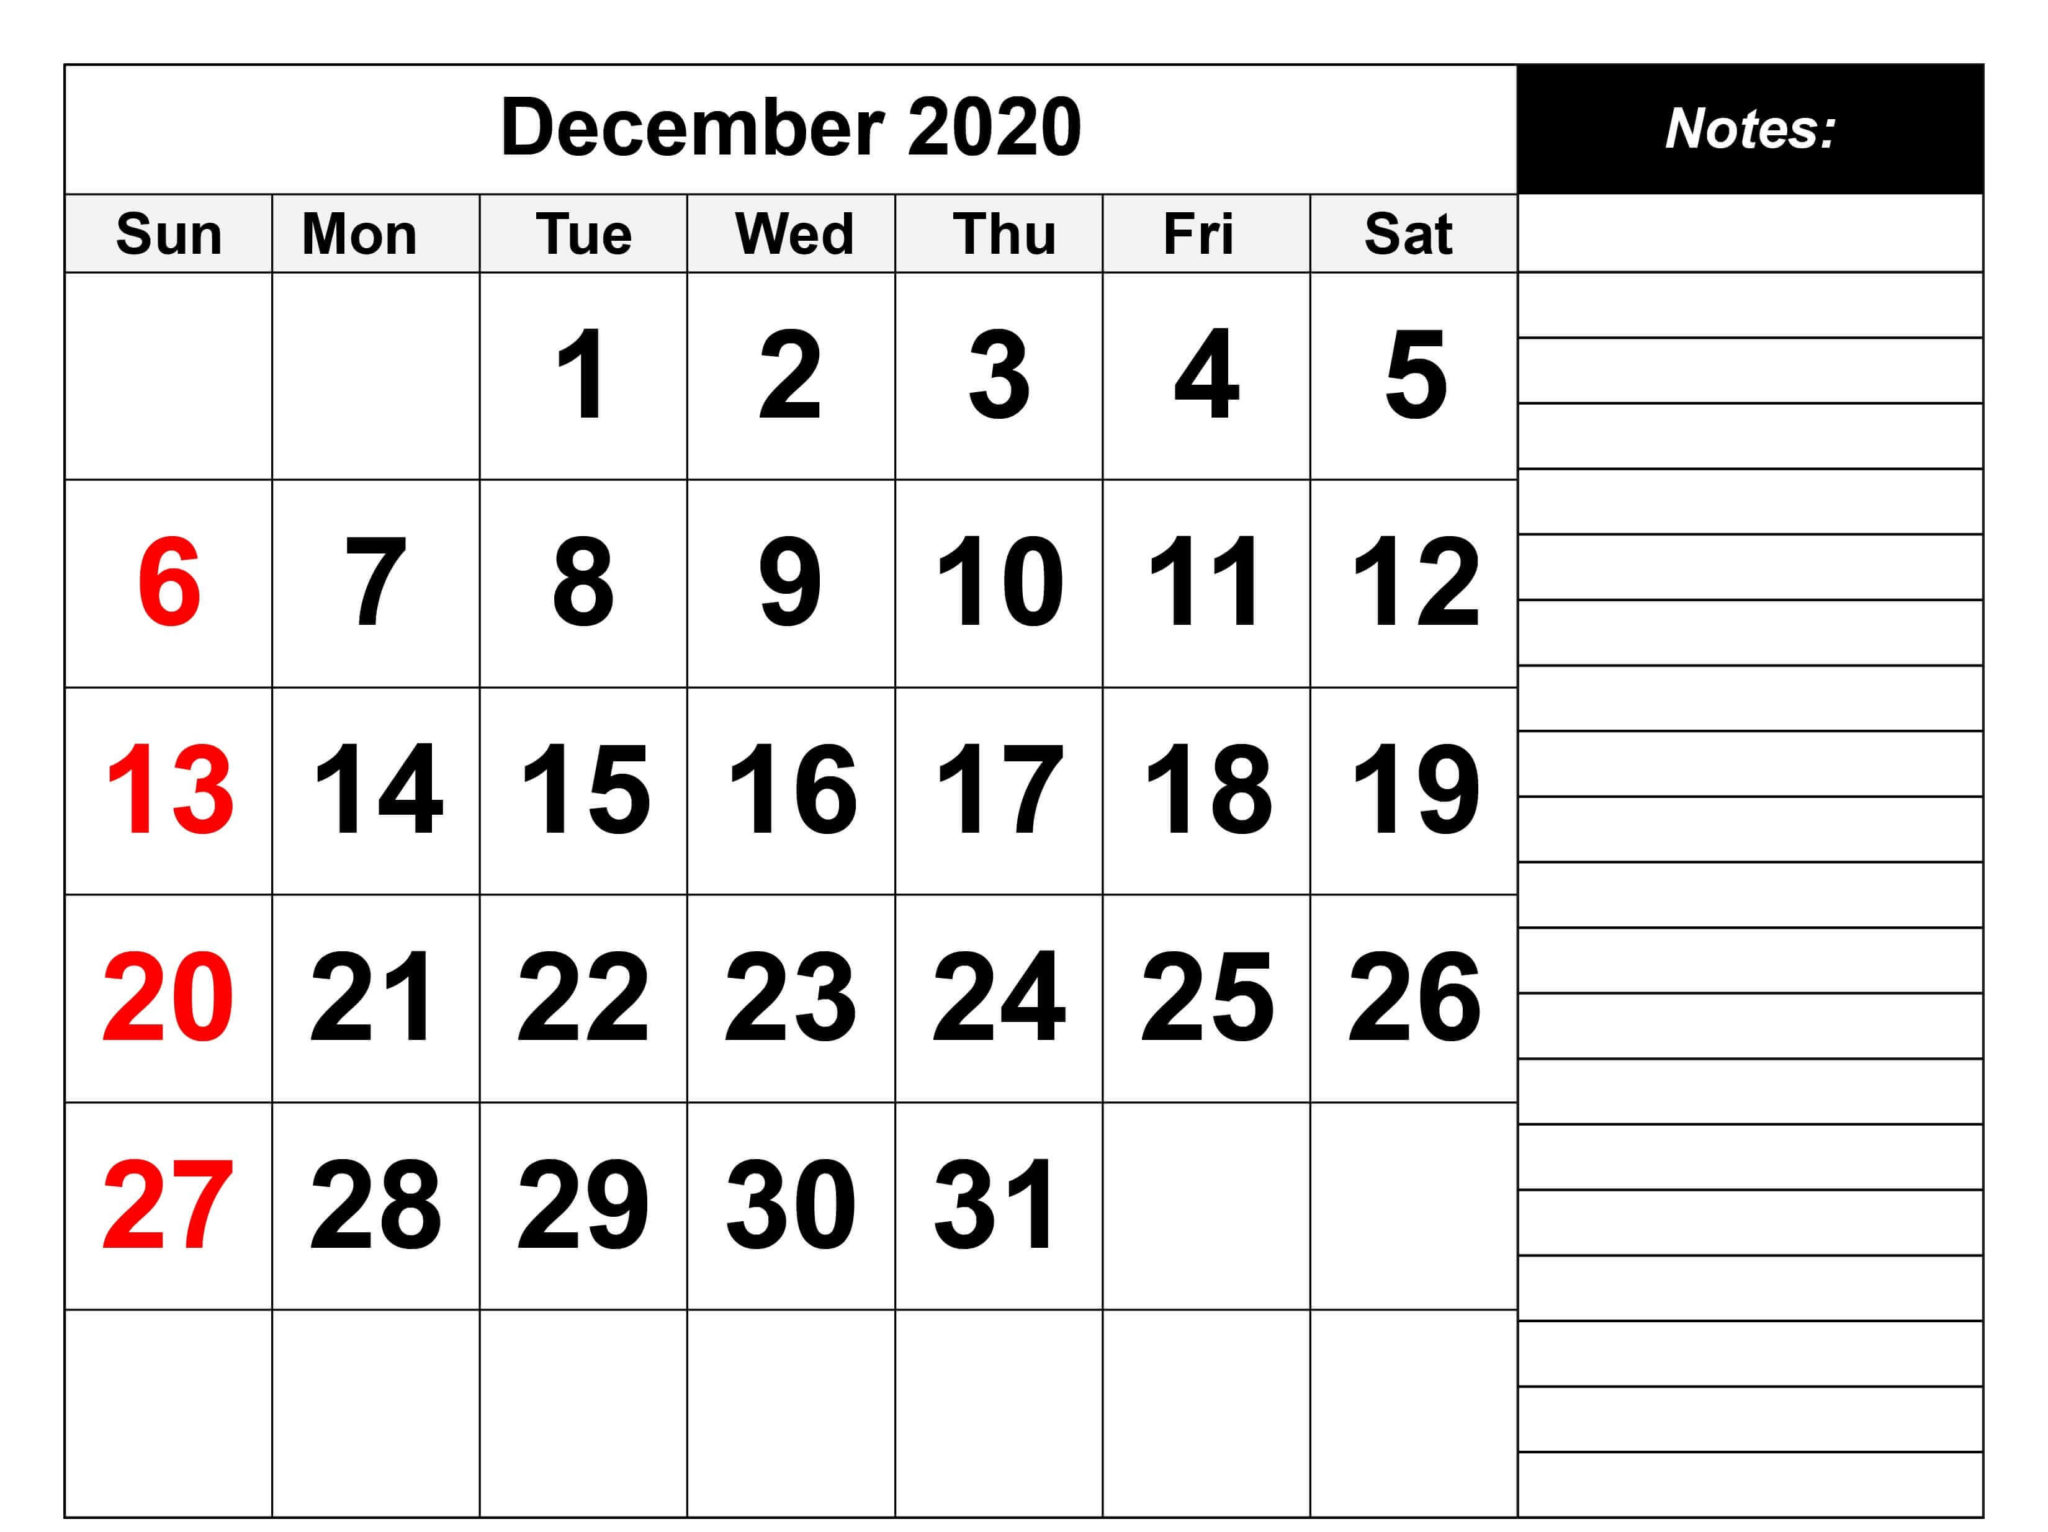 december 2020 notes calendar